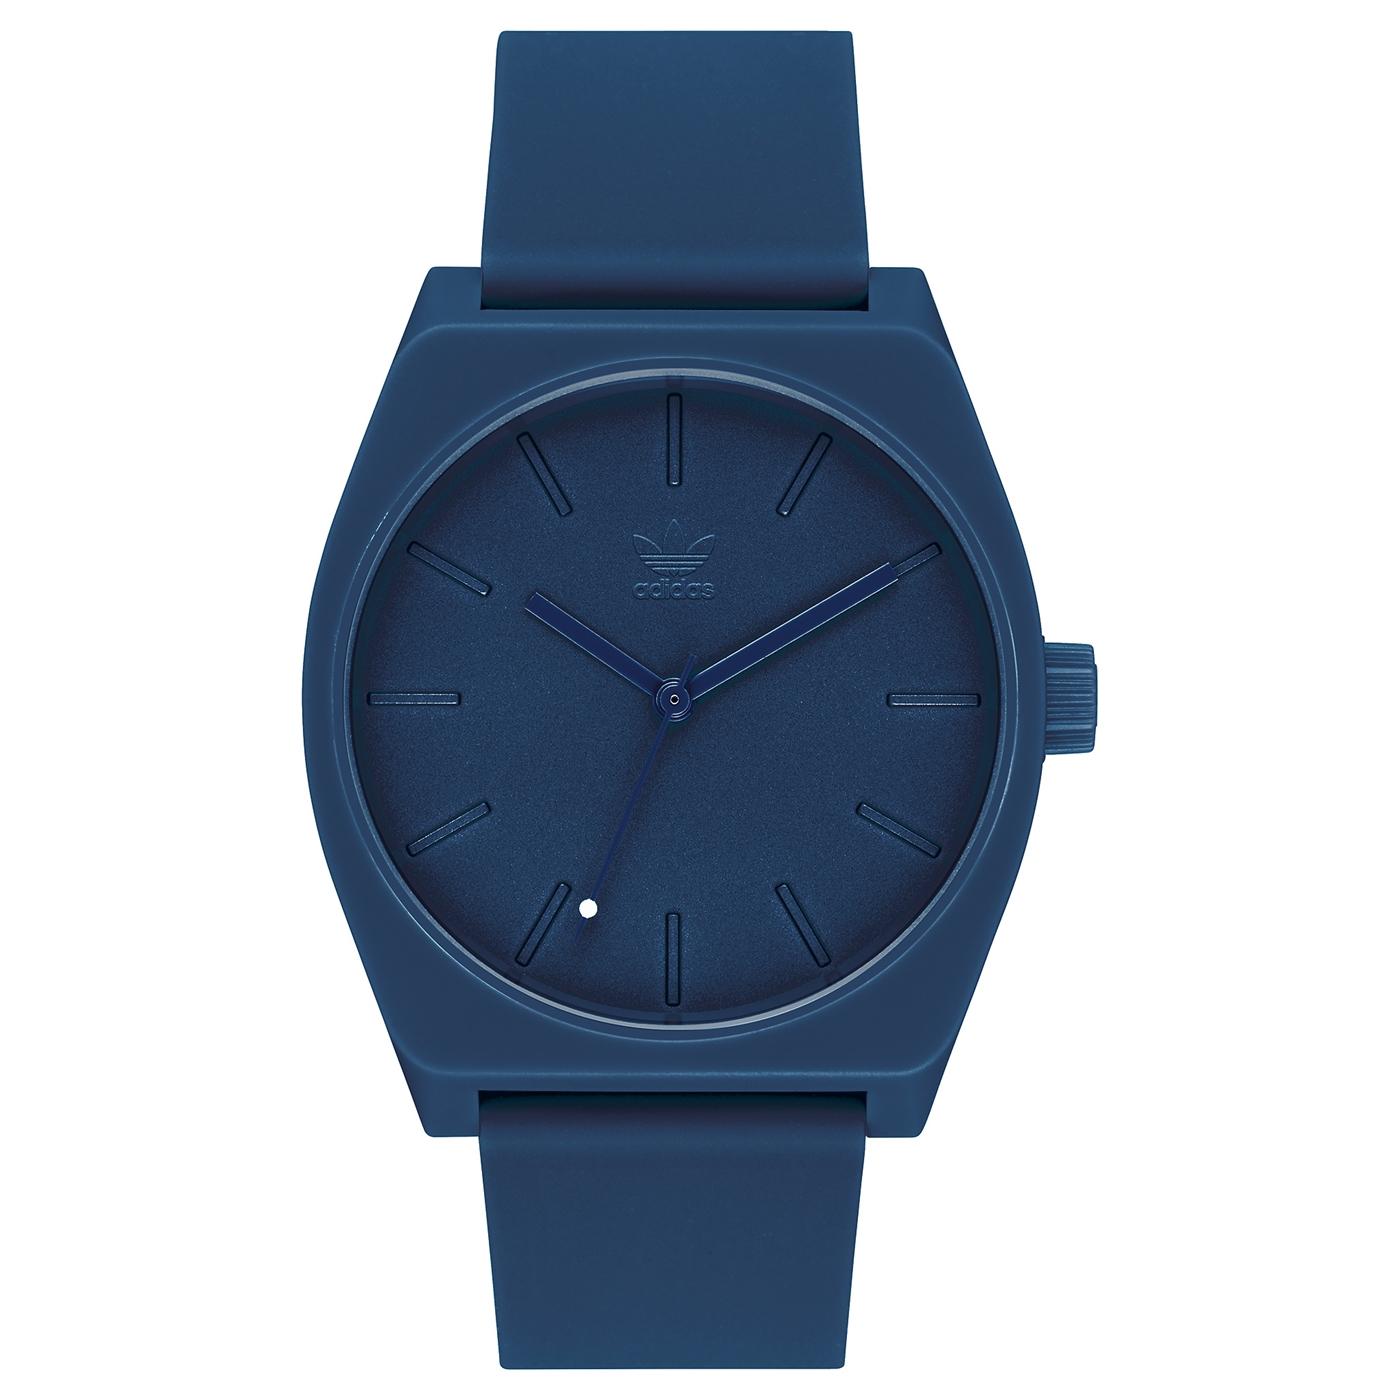 Bilde av Adidas Process watch Z10 2904 00